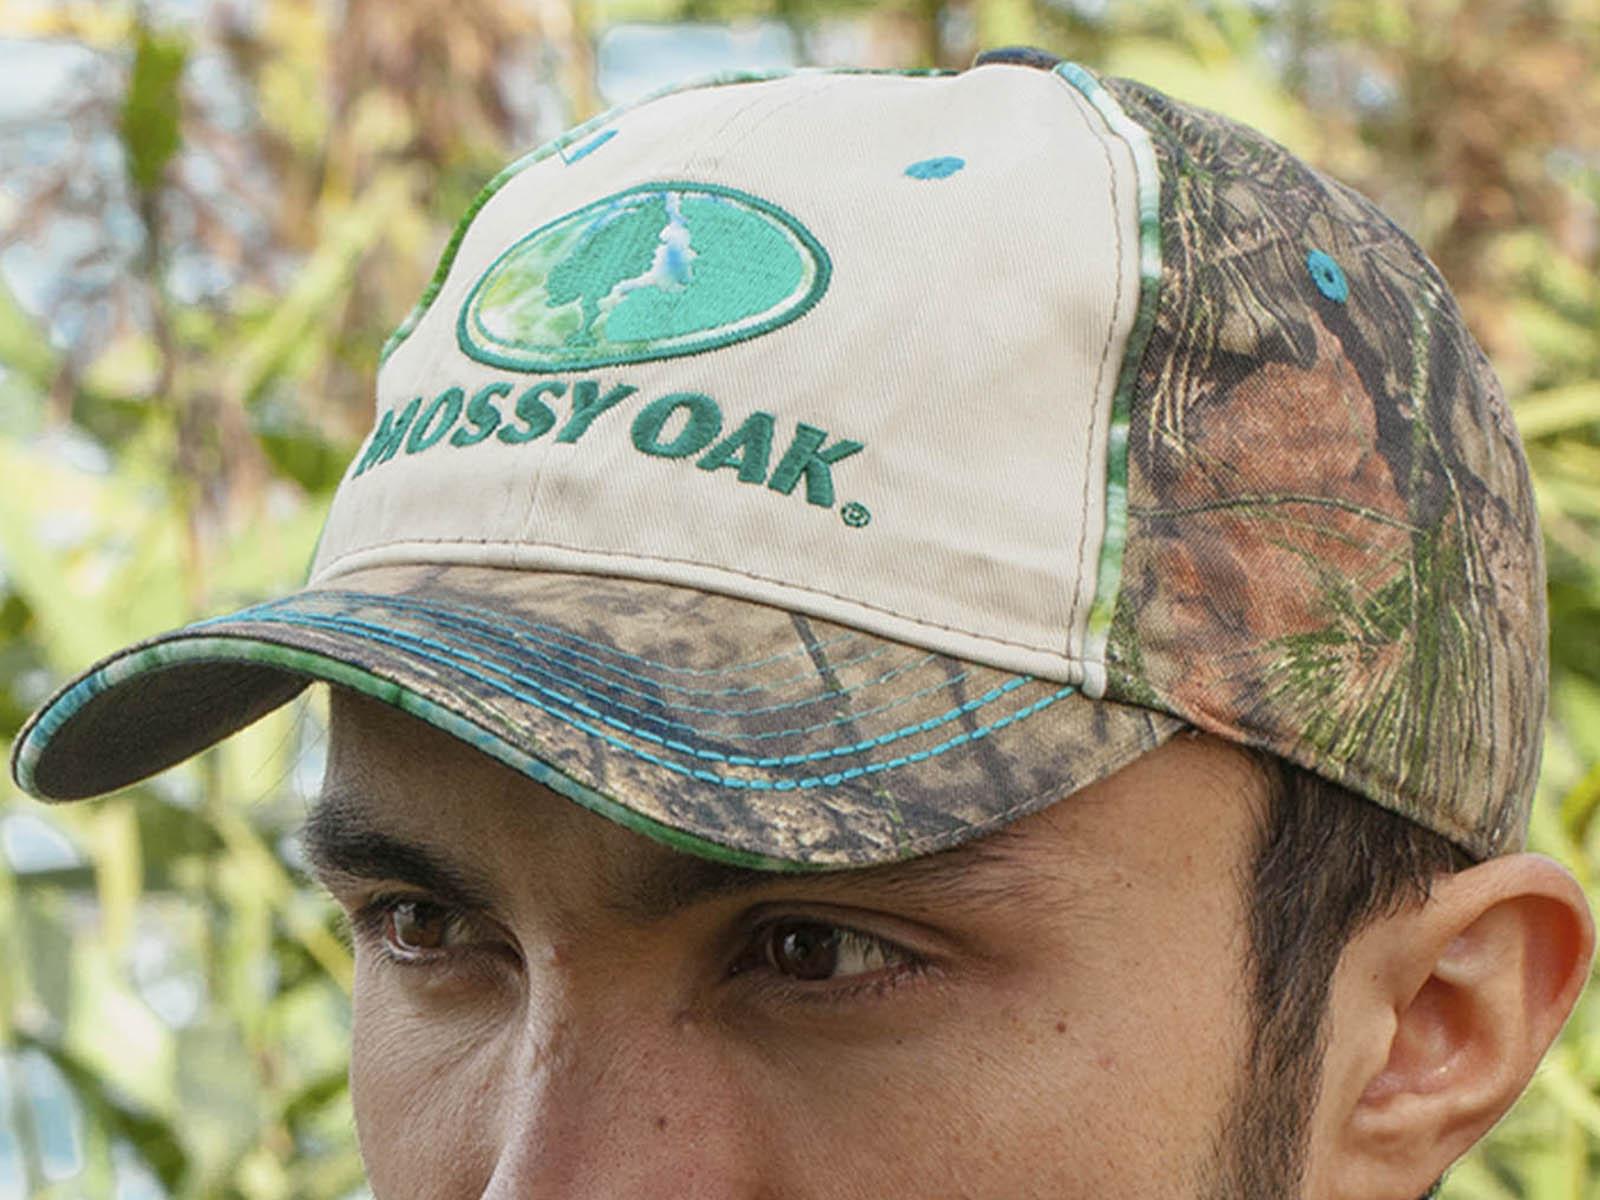 Шедевр стиля и камуфляжа – мужская бейсболка Mossy Oak.